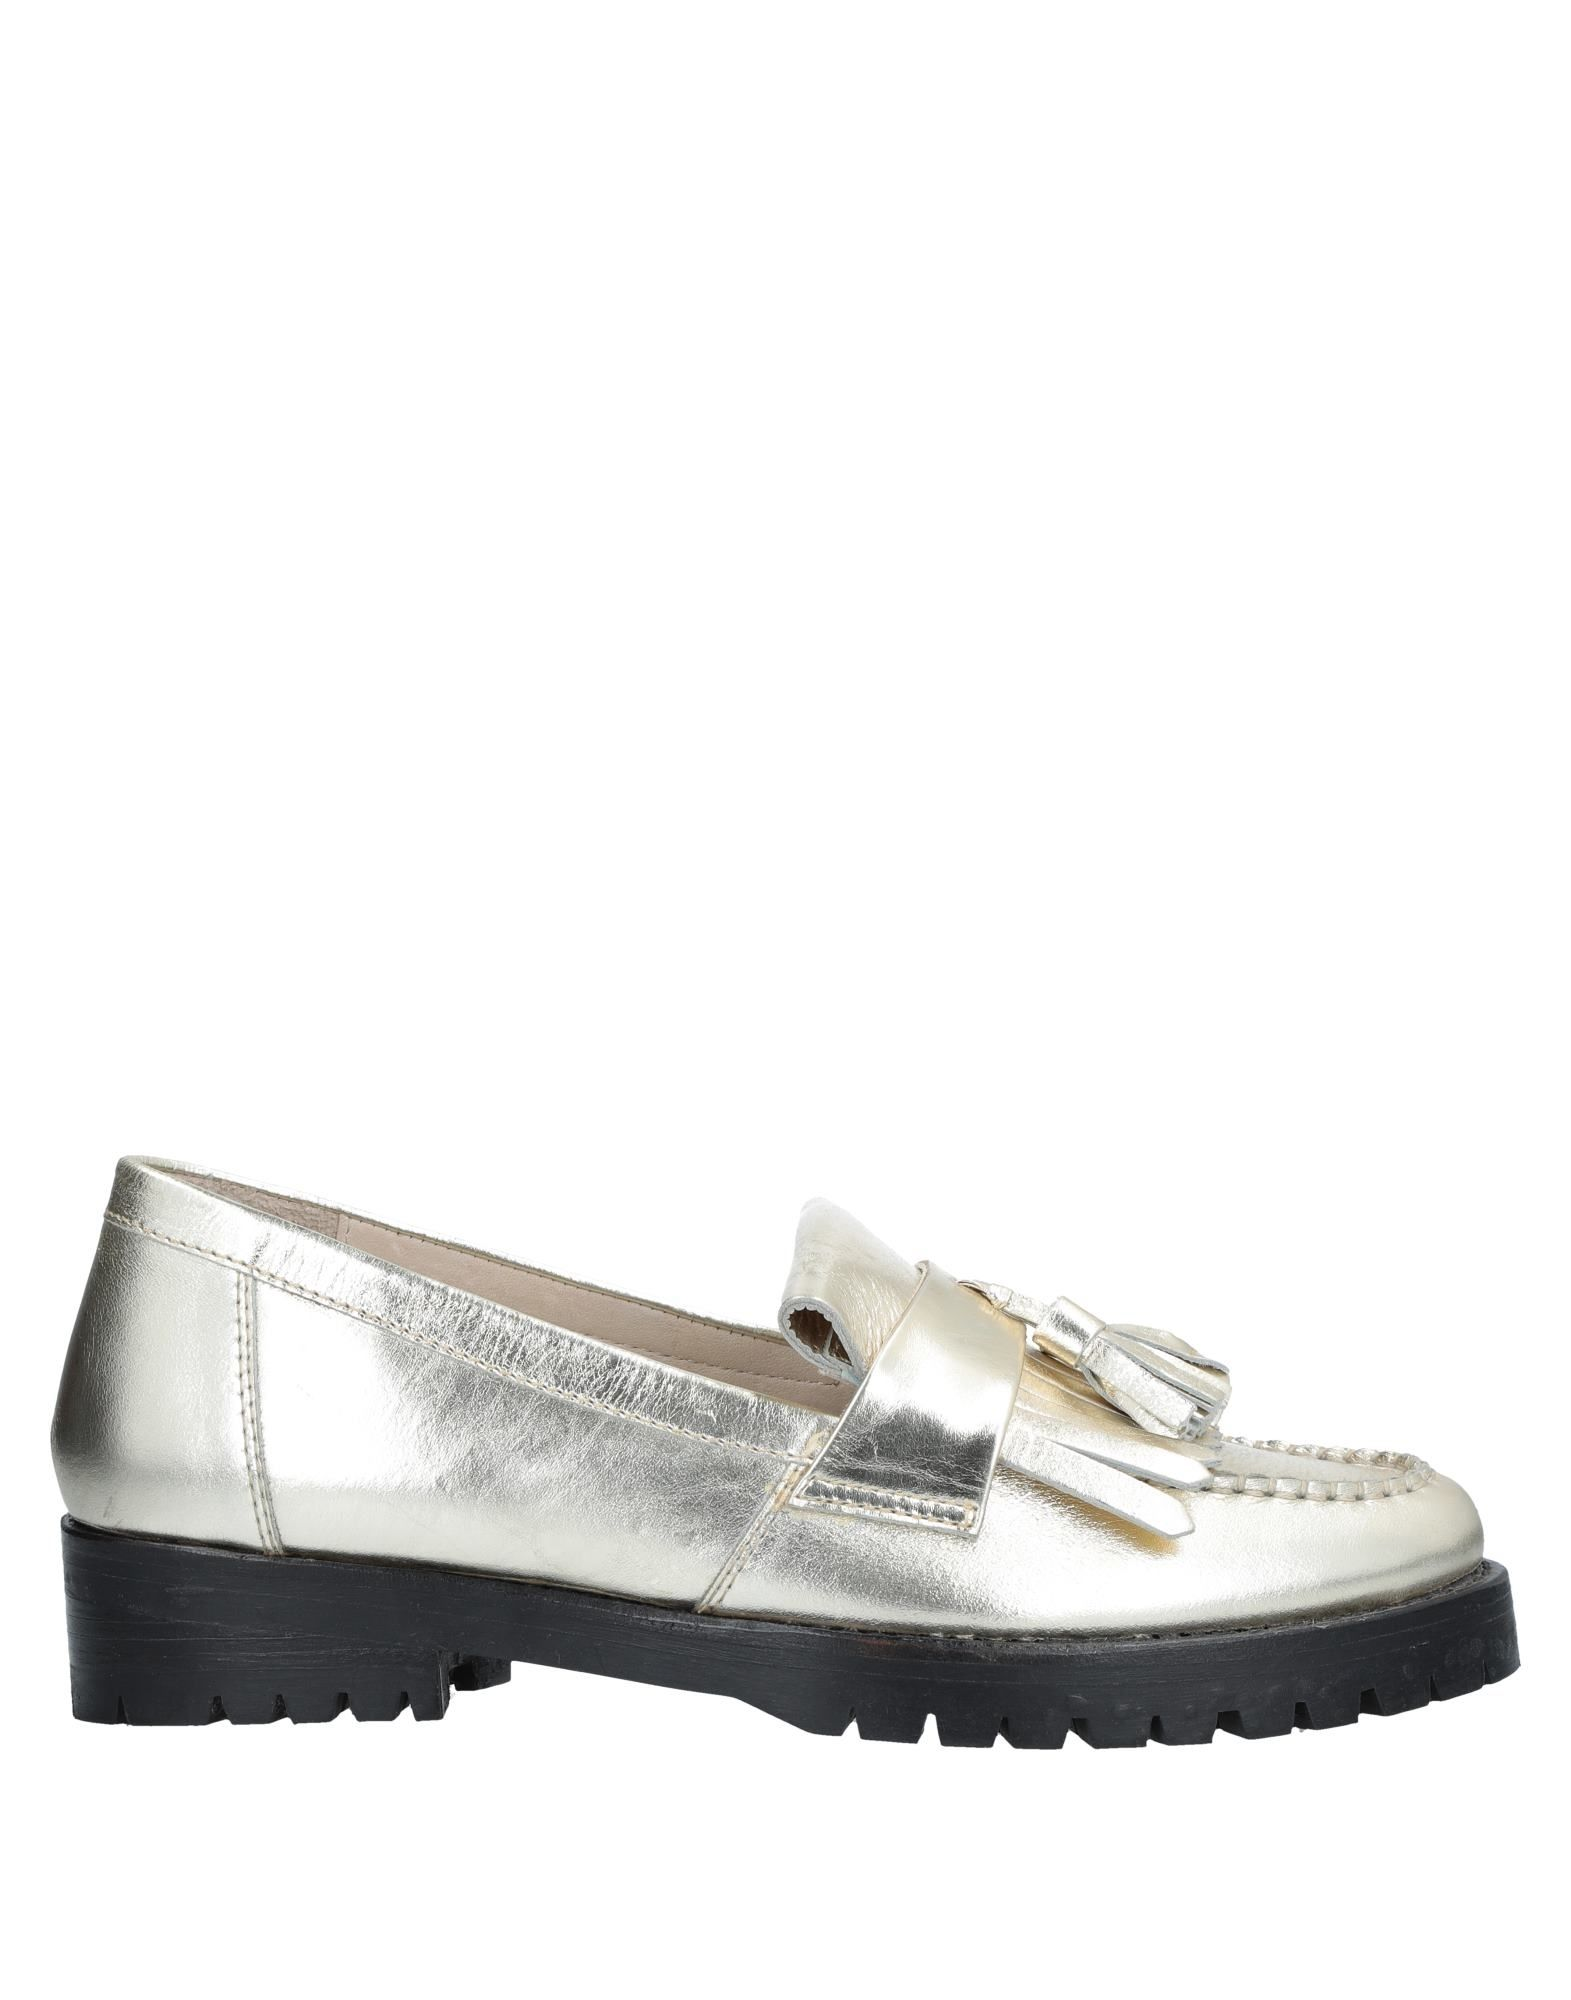 Mr. Wolf Mokassins Damen  11539404MF Gute Qualität beliebte Schuhe